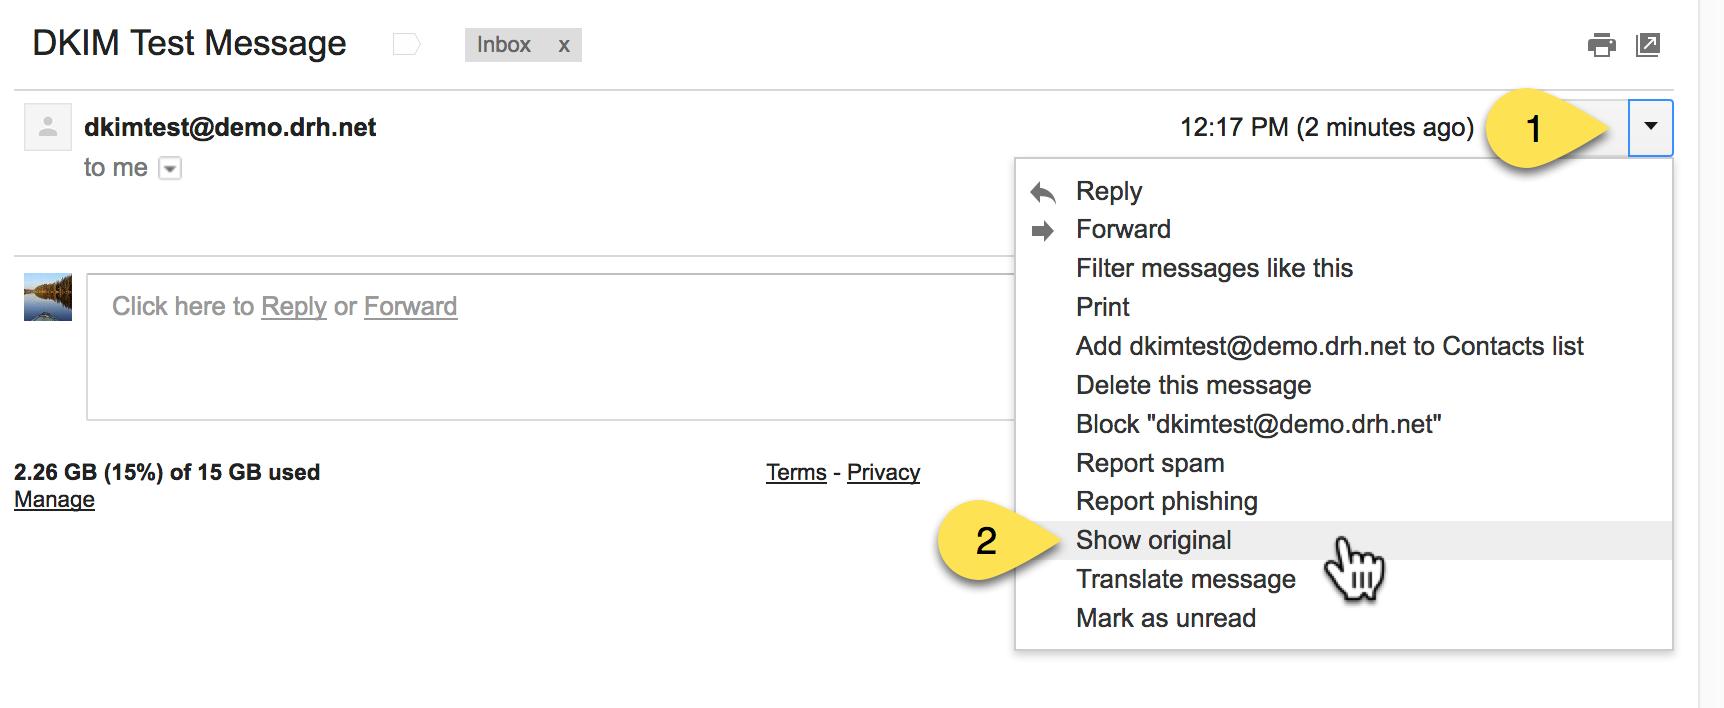 engine-testing-dkim-gmail-show-original.png